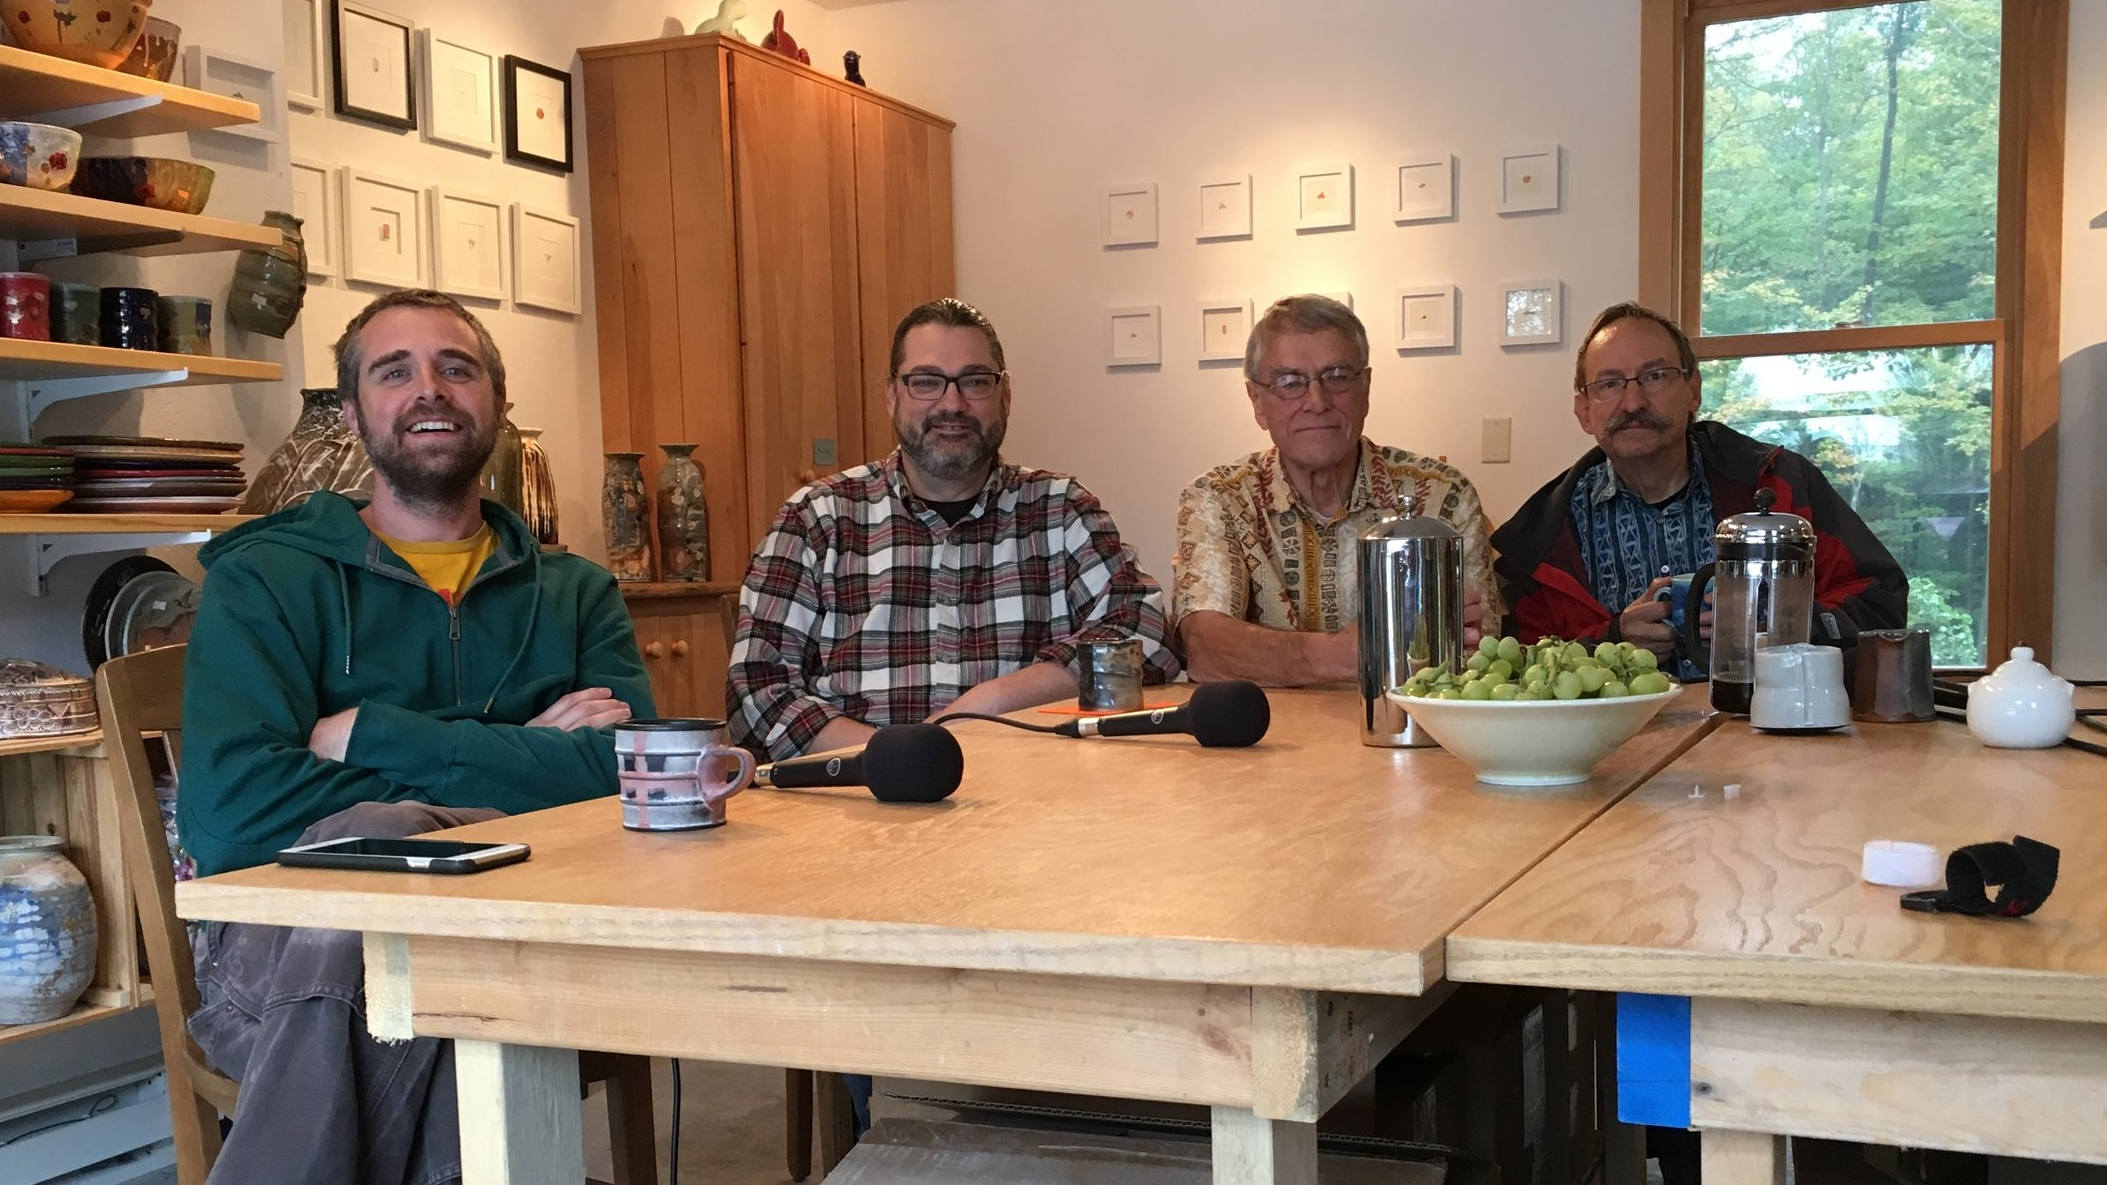 Justin Rothshank, Mark Goertzen, Marvin Bartel, and Dick Lehman